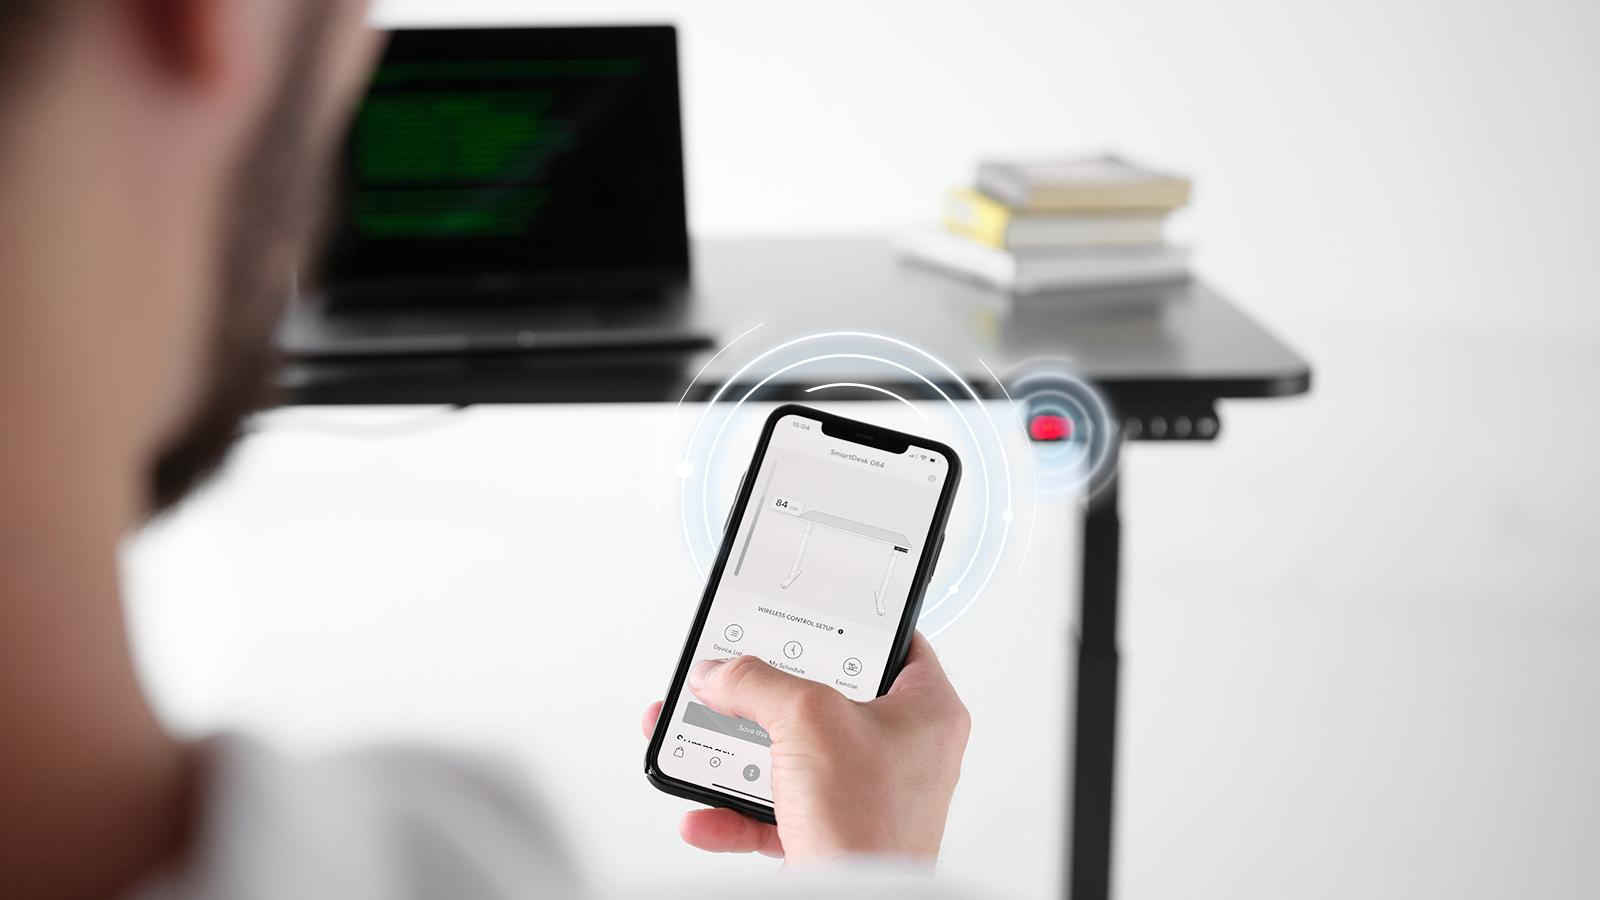 Control wirelessly